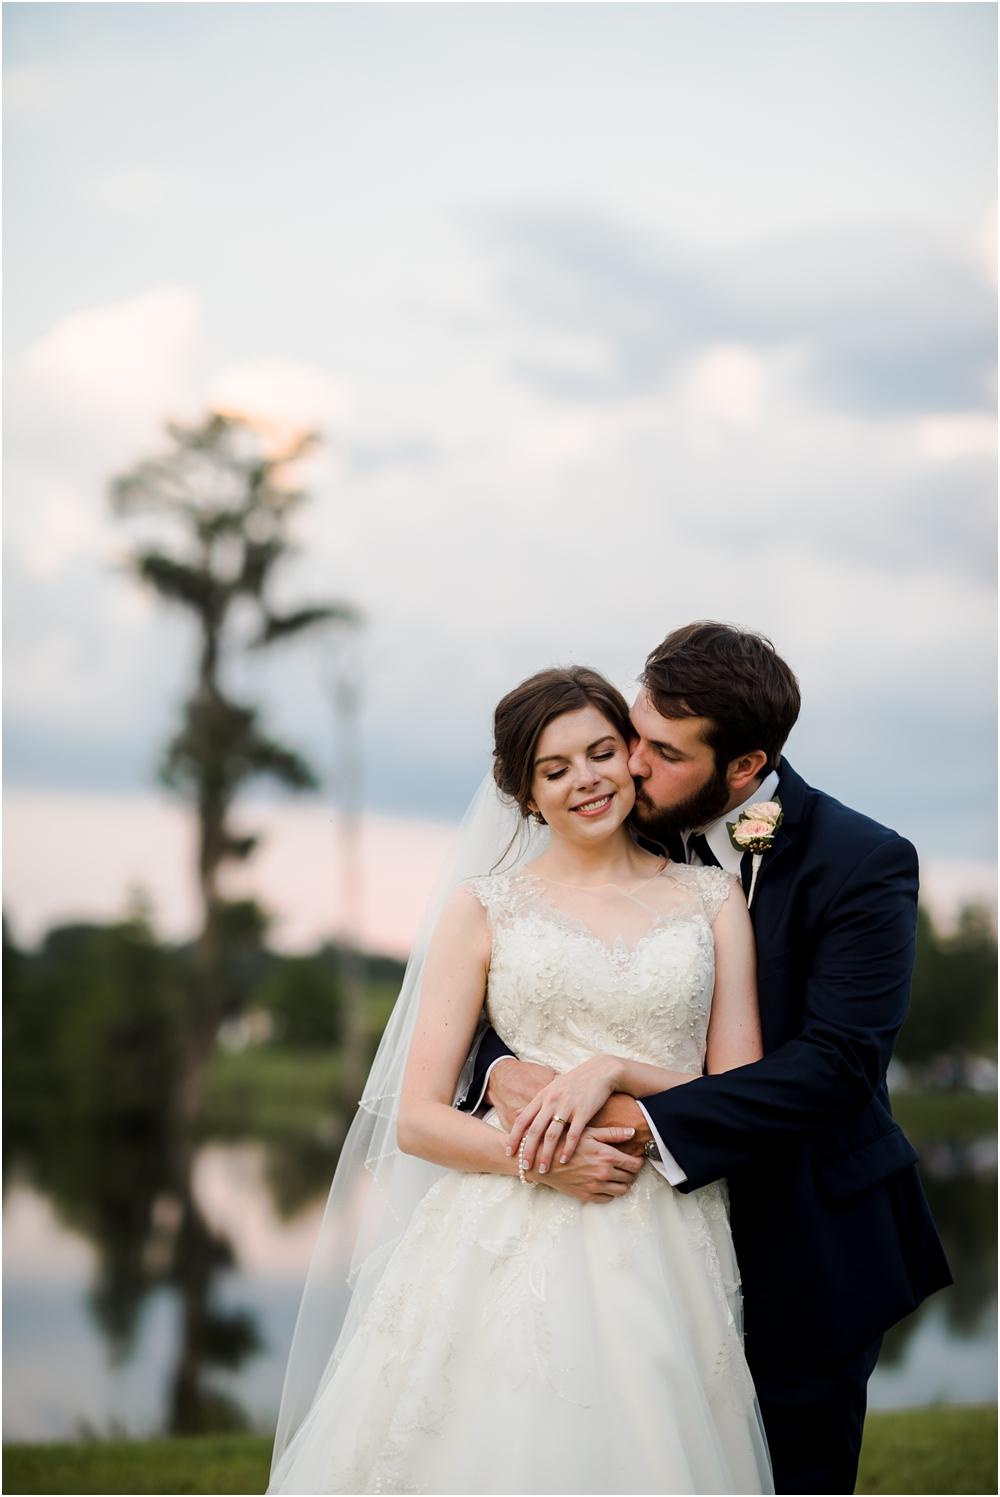 marianna-florida-wedding-photographer-kiersten-grant-160.jpg